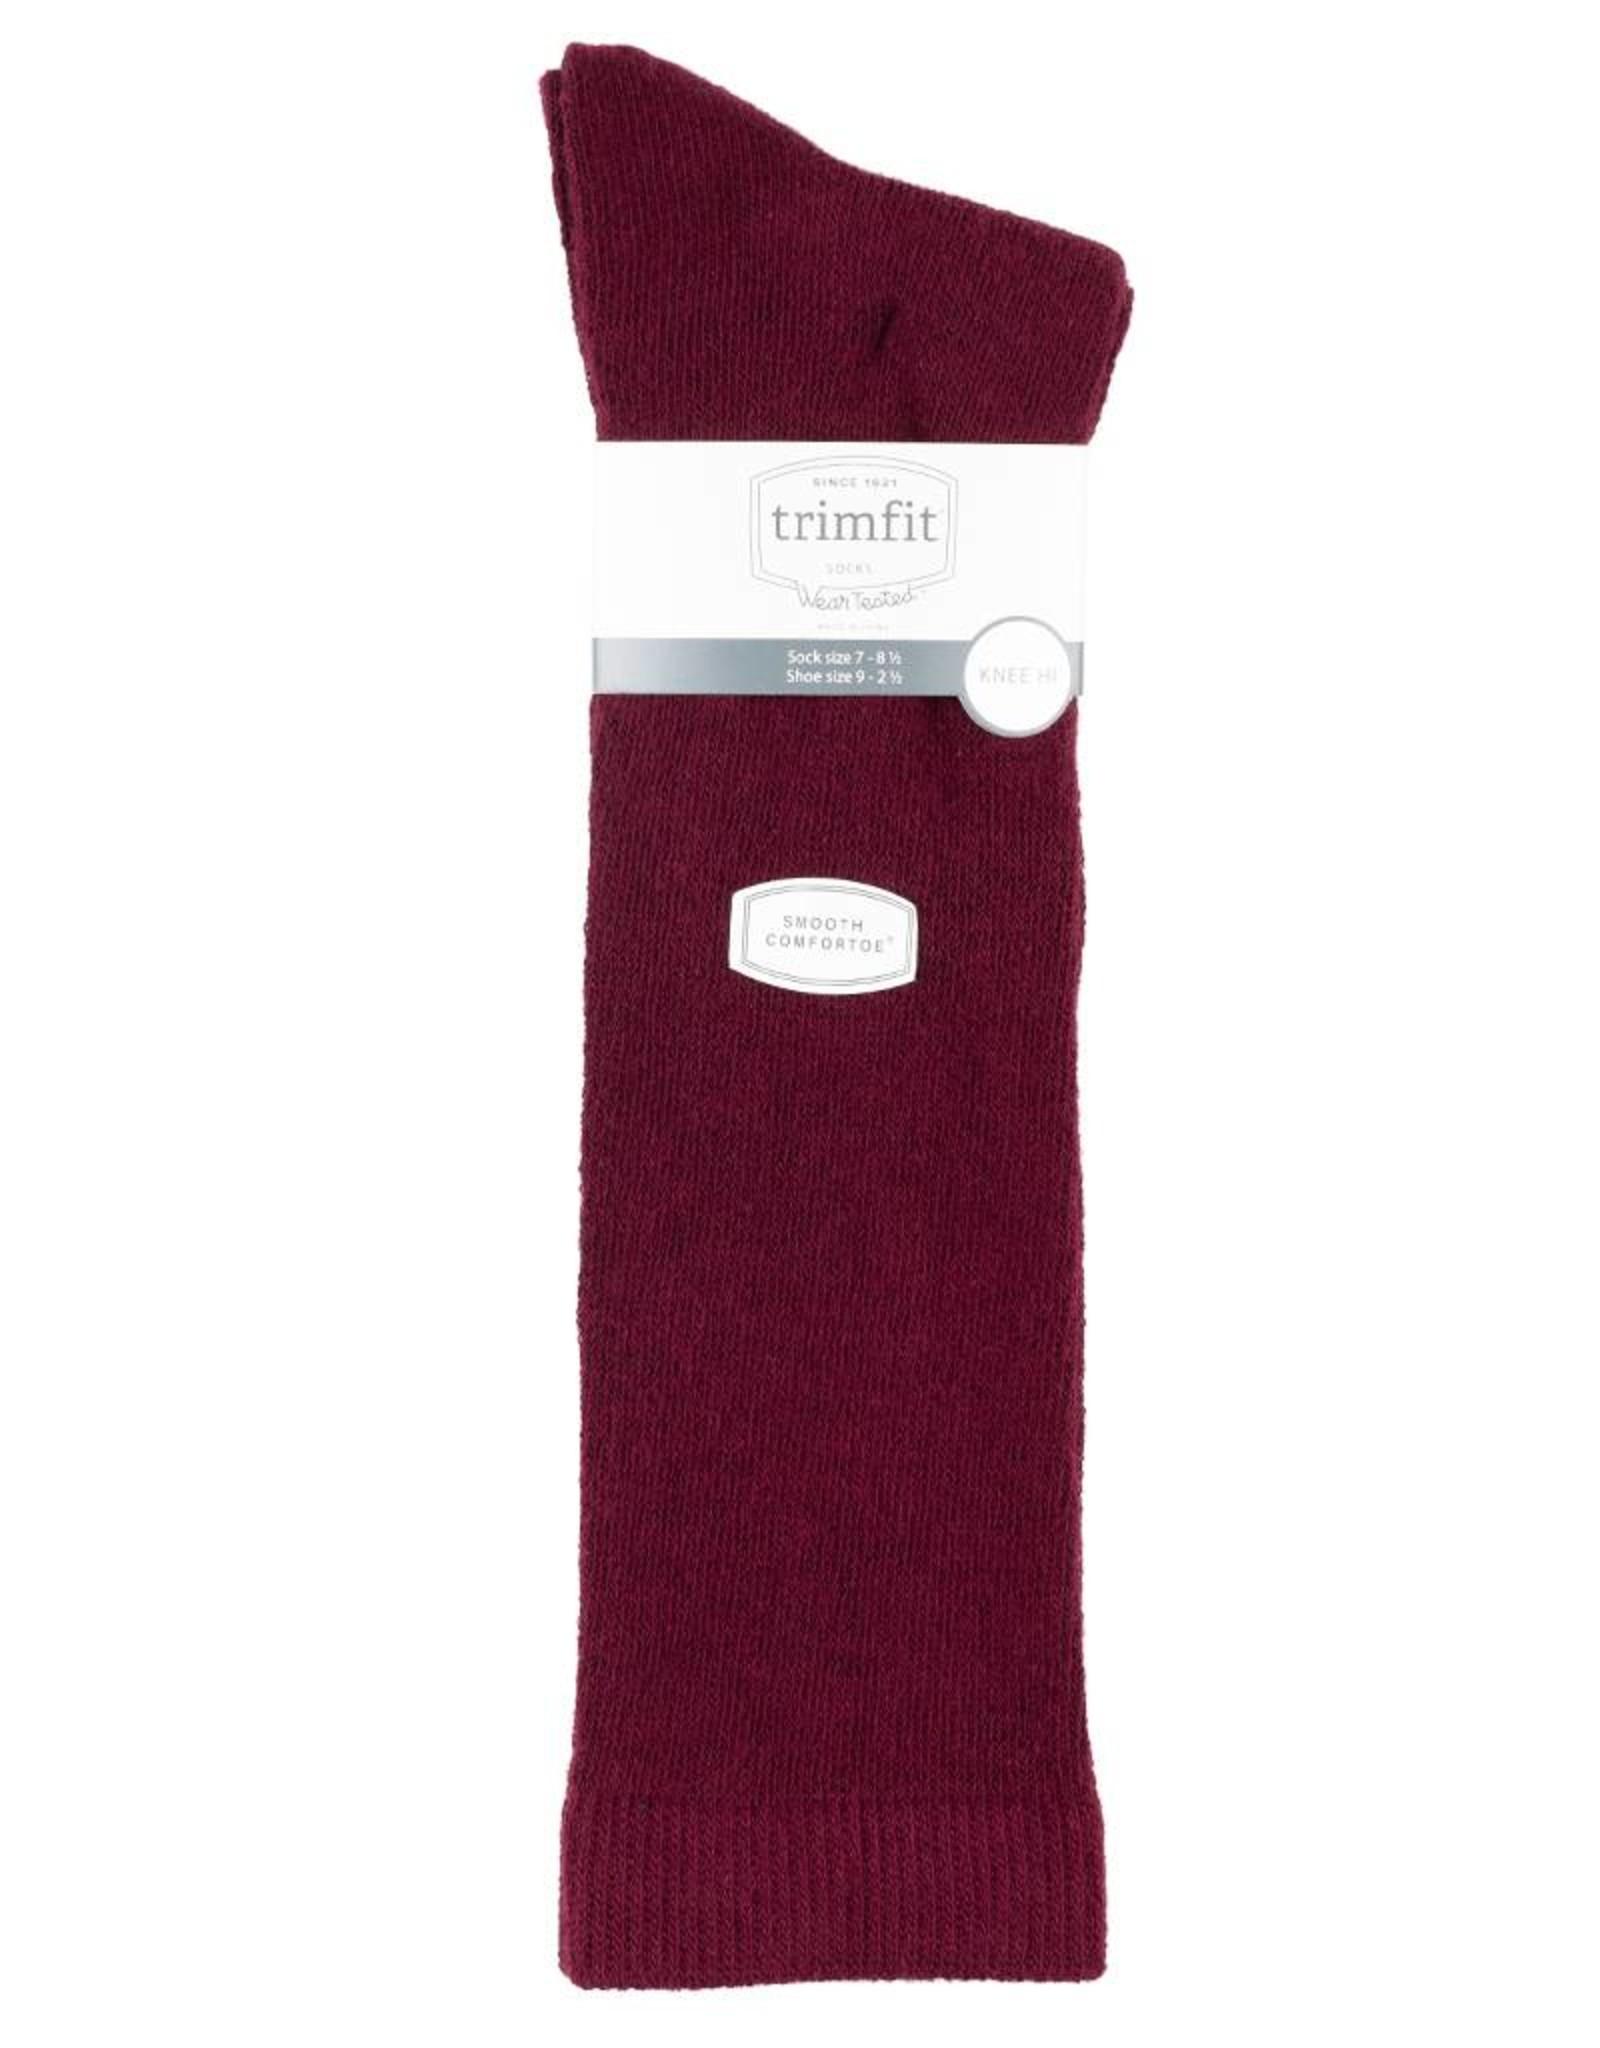 Trimfit Trimfit Basic Cotton Knee Socks